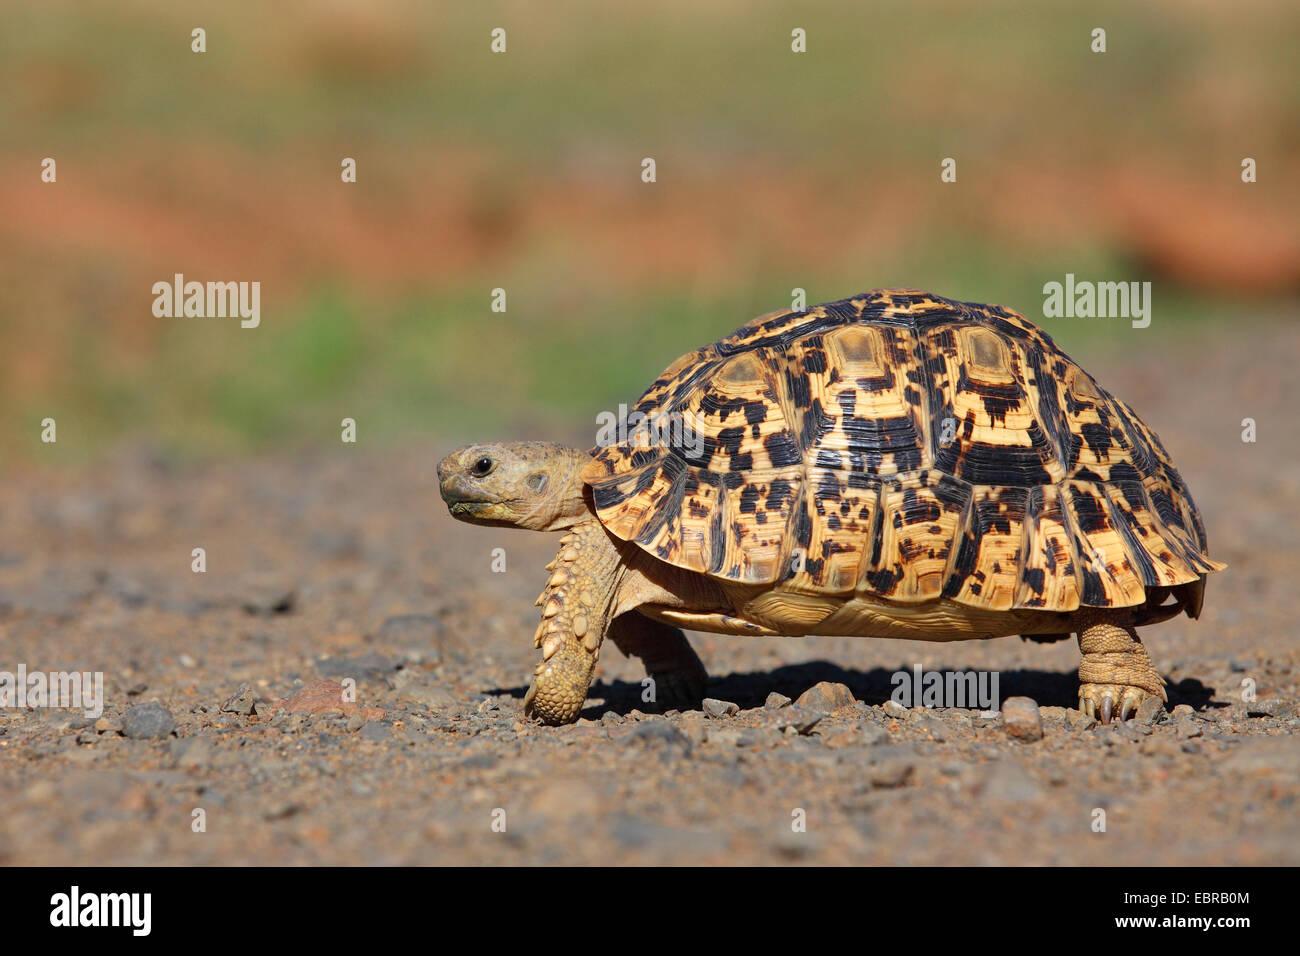 Leopard tortoise (Stigmochelys pardalis, Geochelone pardalis), walking, South Africa, Pilanesberg National Park Stock Photo